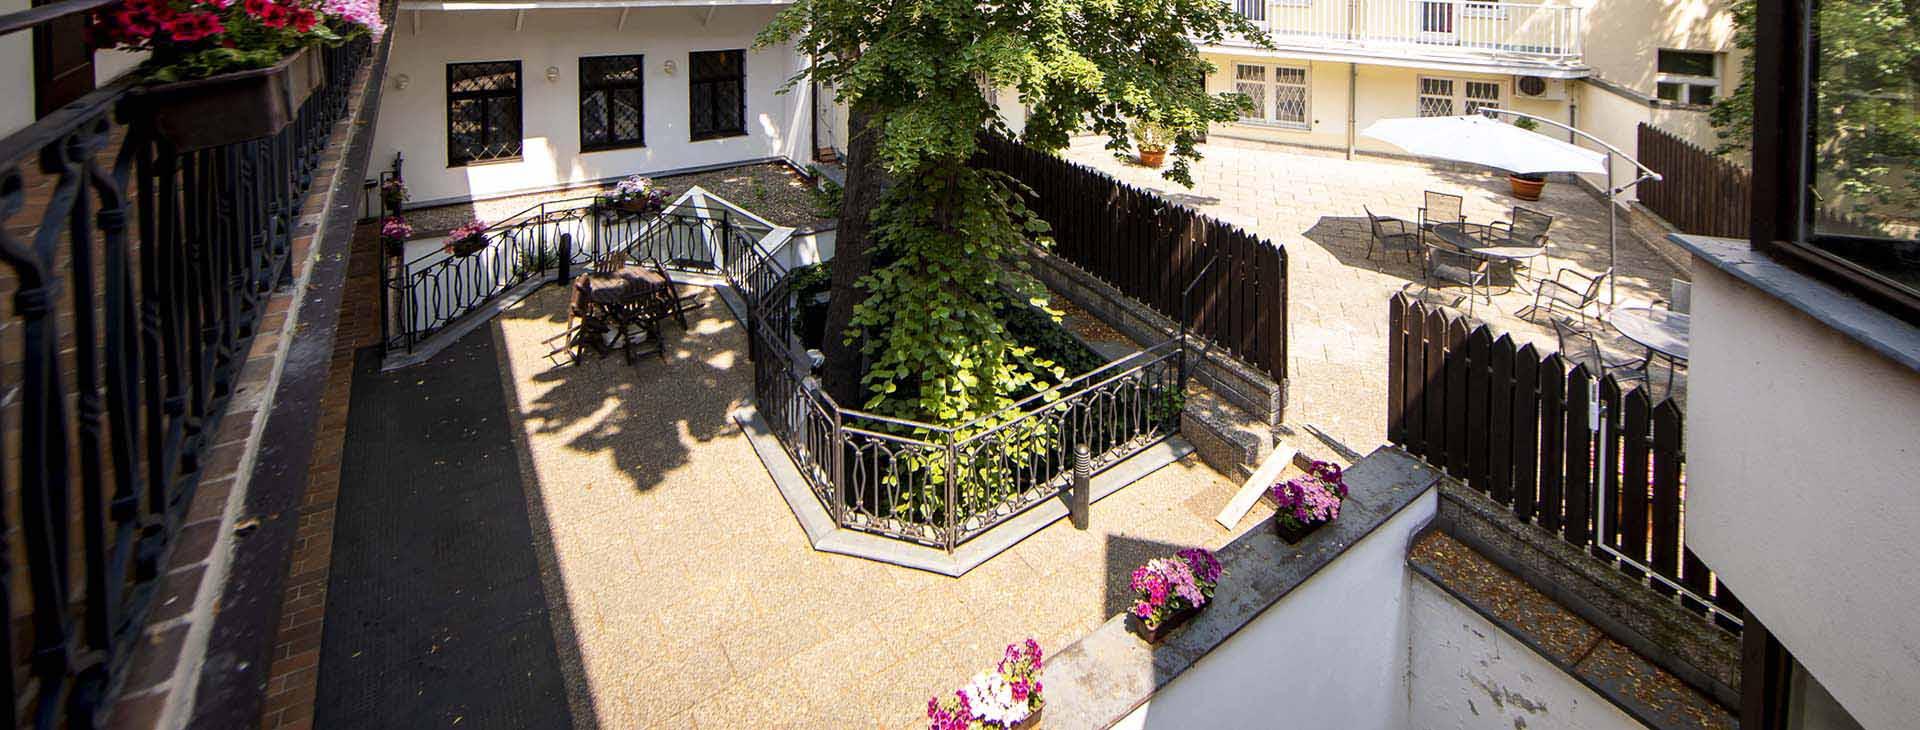 amadeus hotel prague terrace